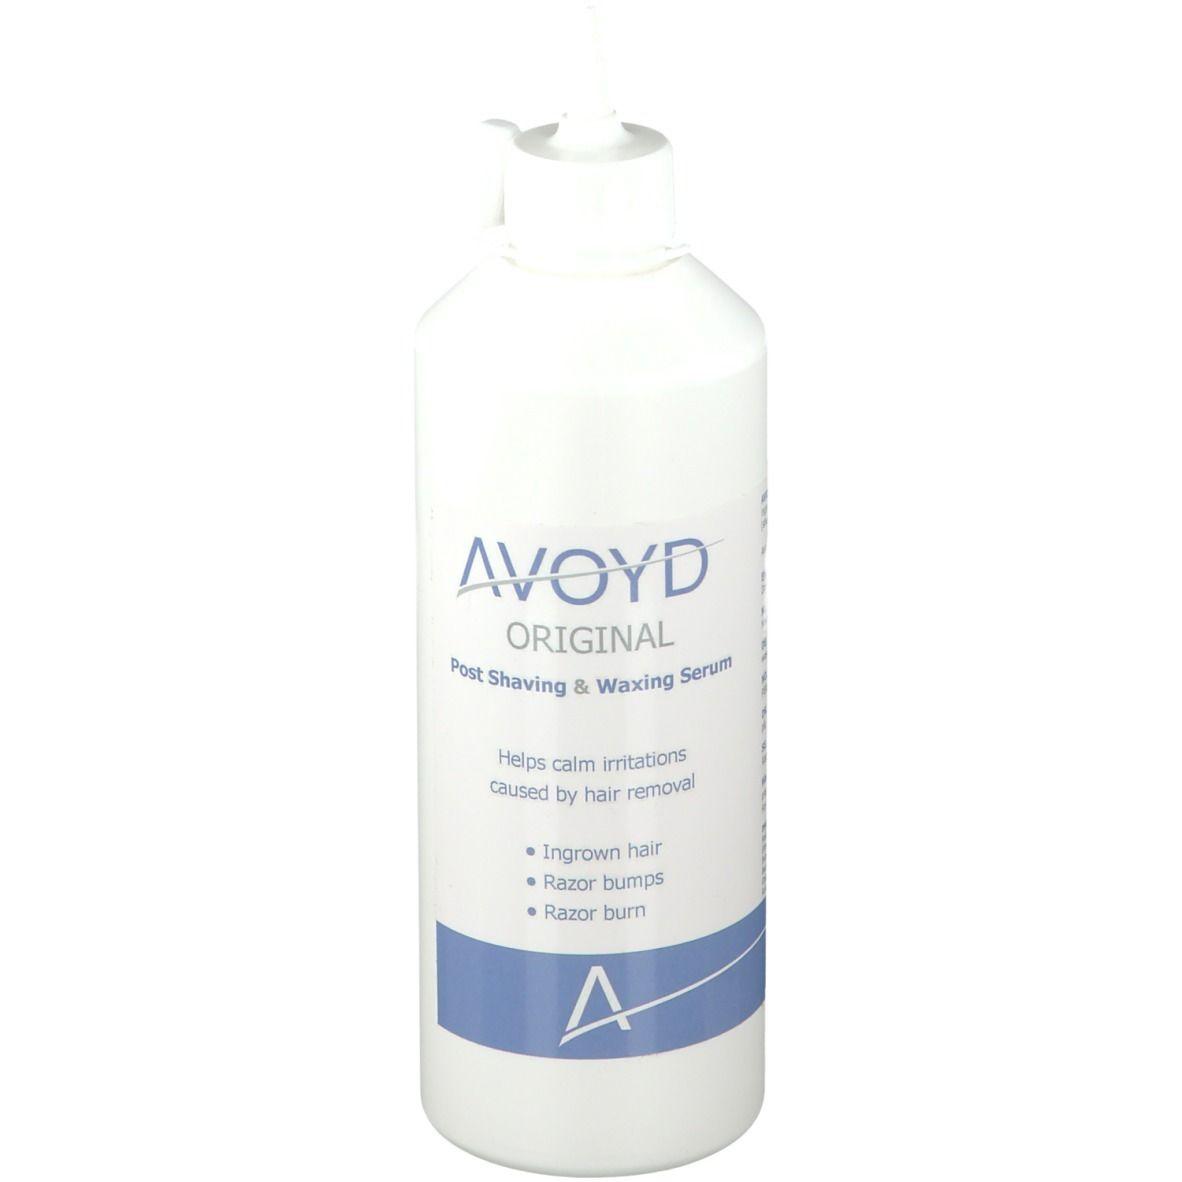 Image of AVOYD Original Serum